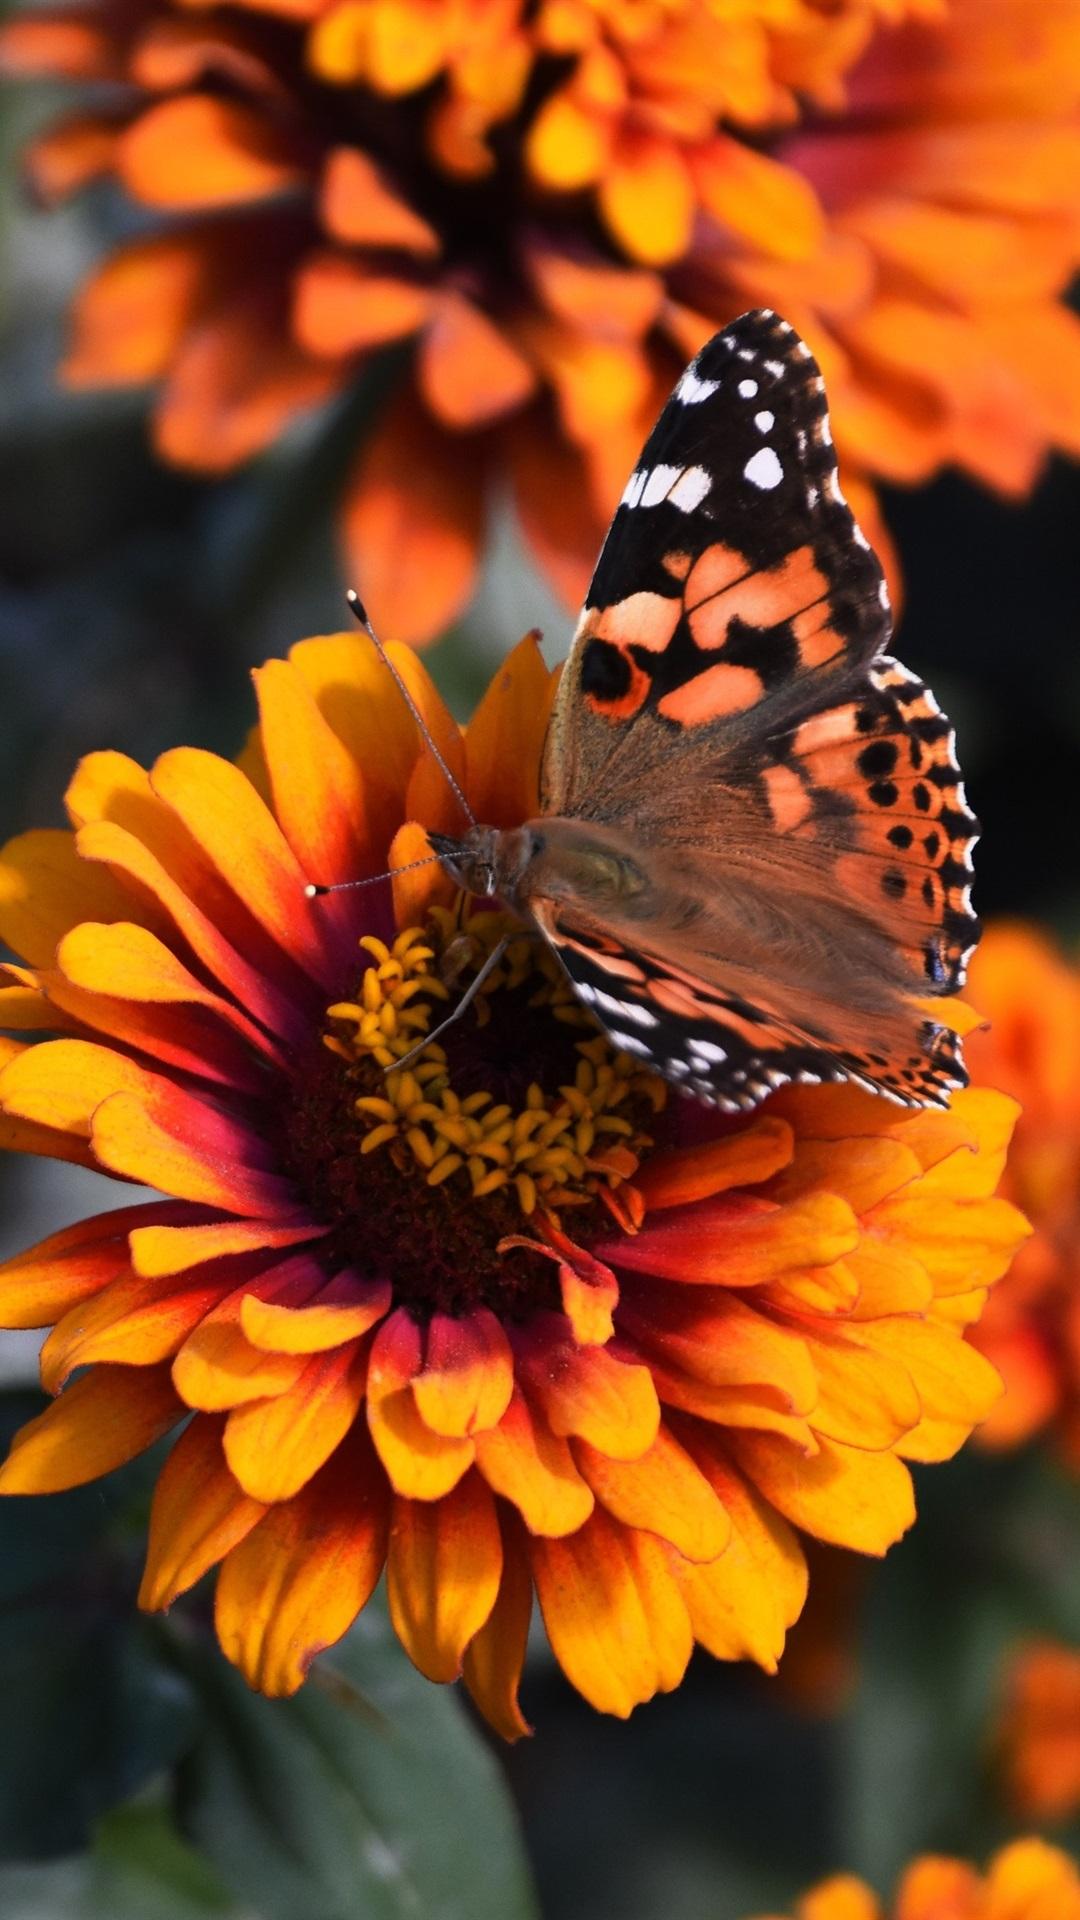 Butterfly Wallpaper Iphone X